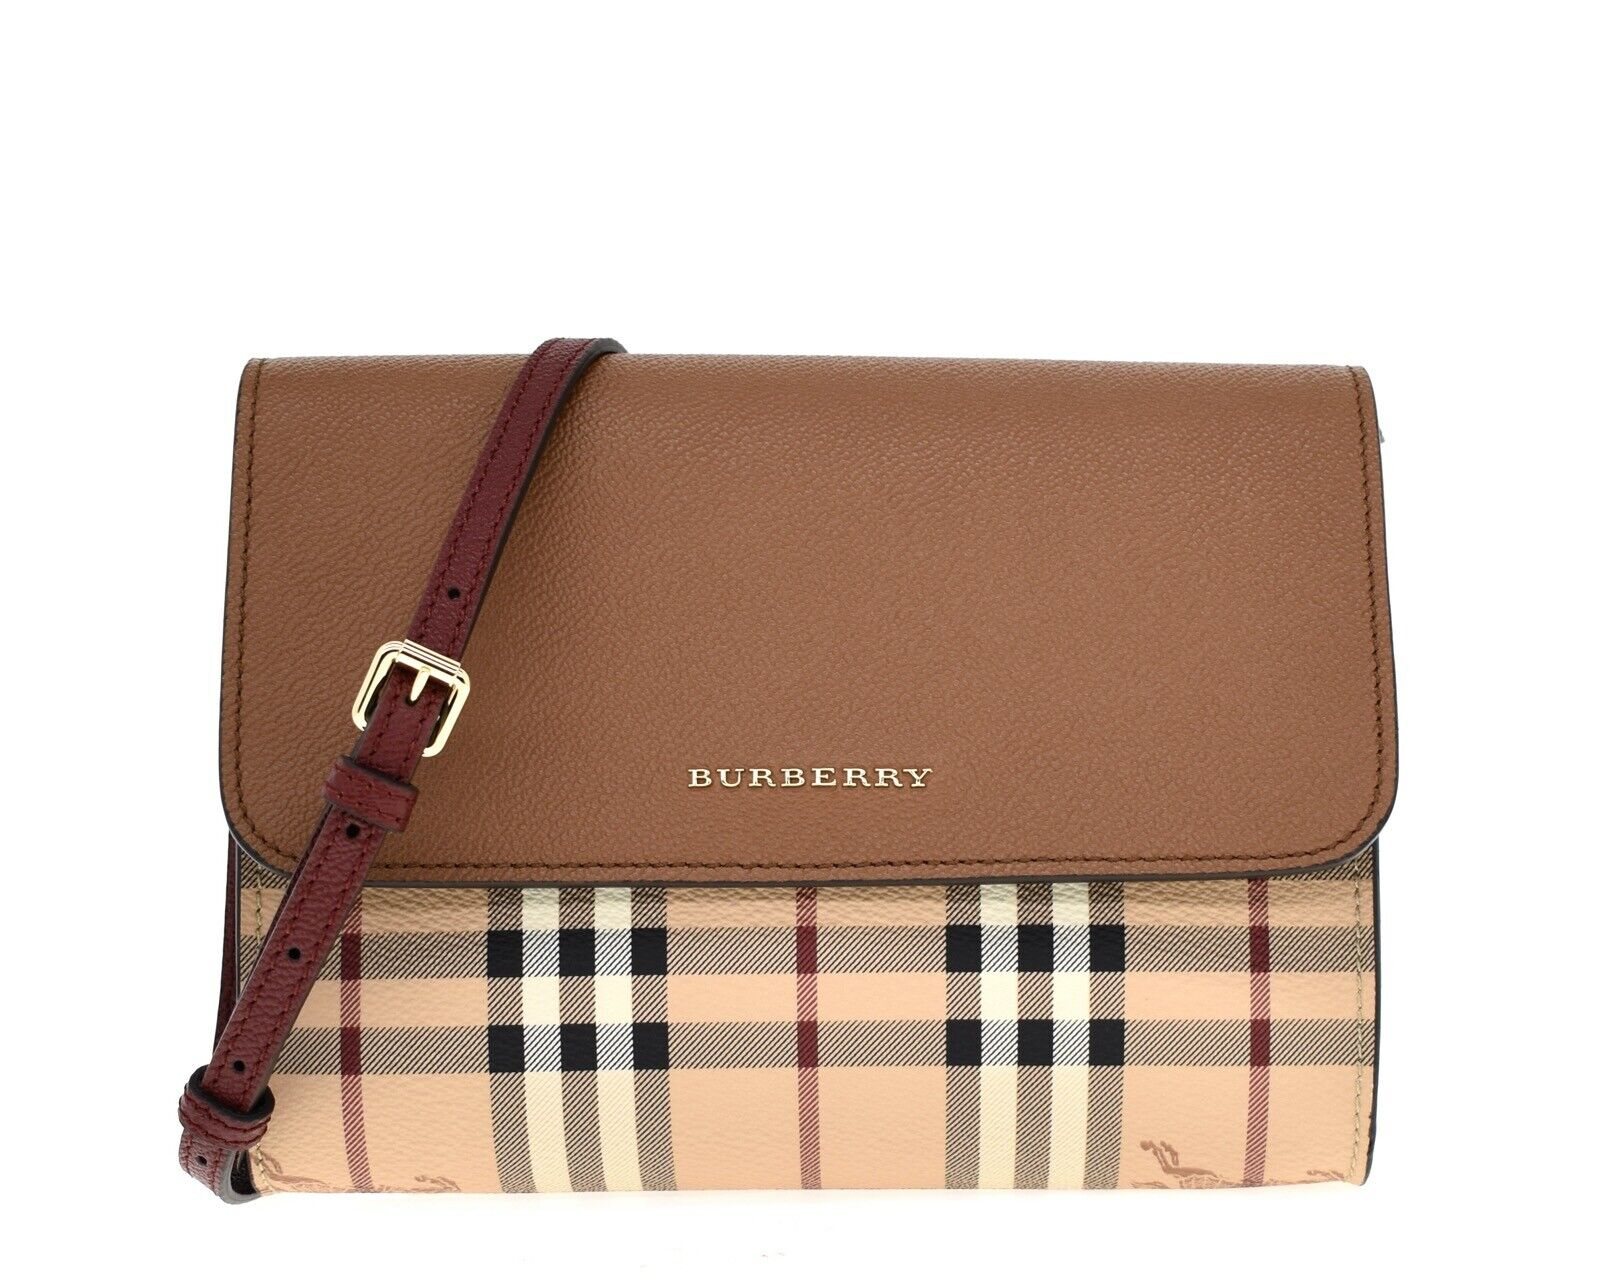 Burberry Loxley Heymarket Crossbody Bag Clutch New